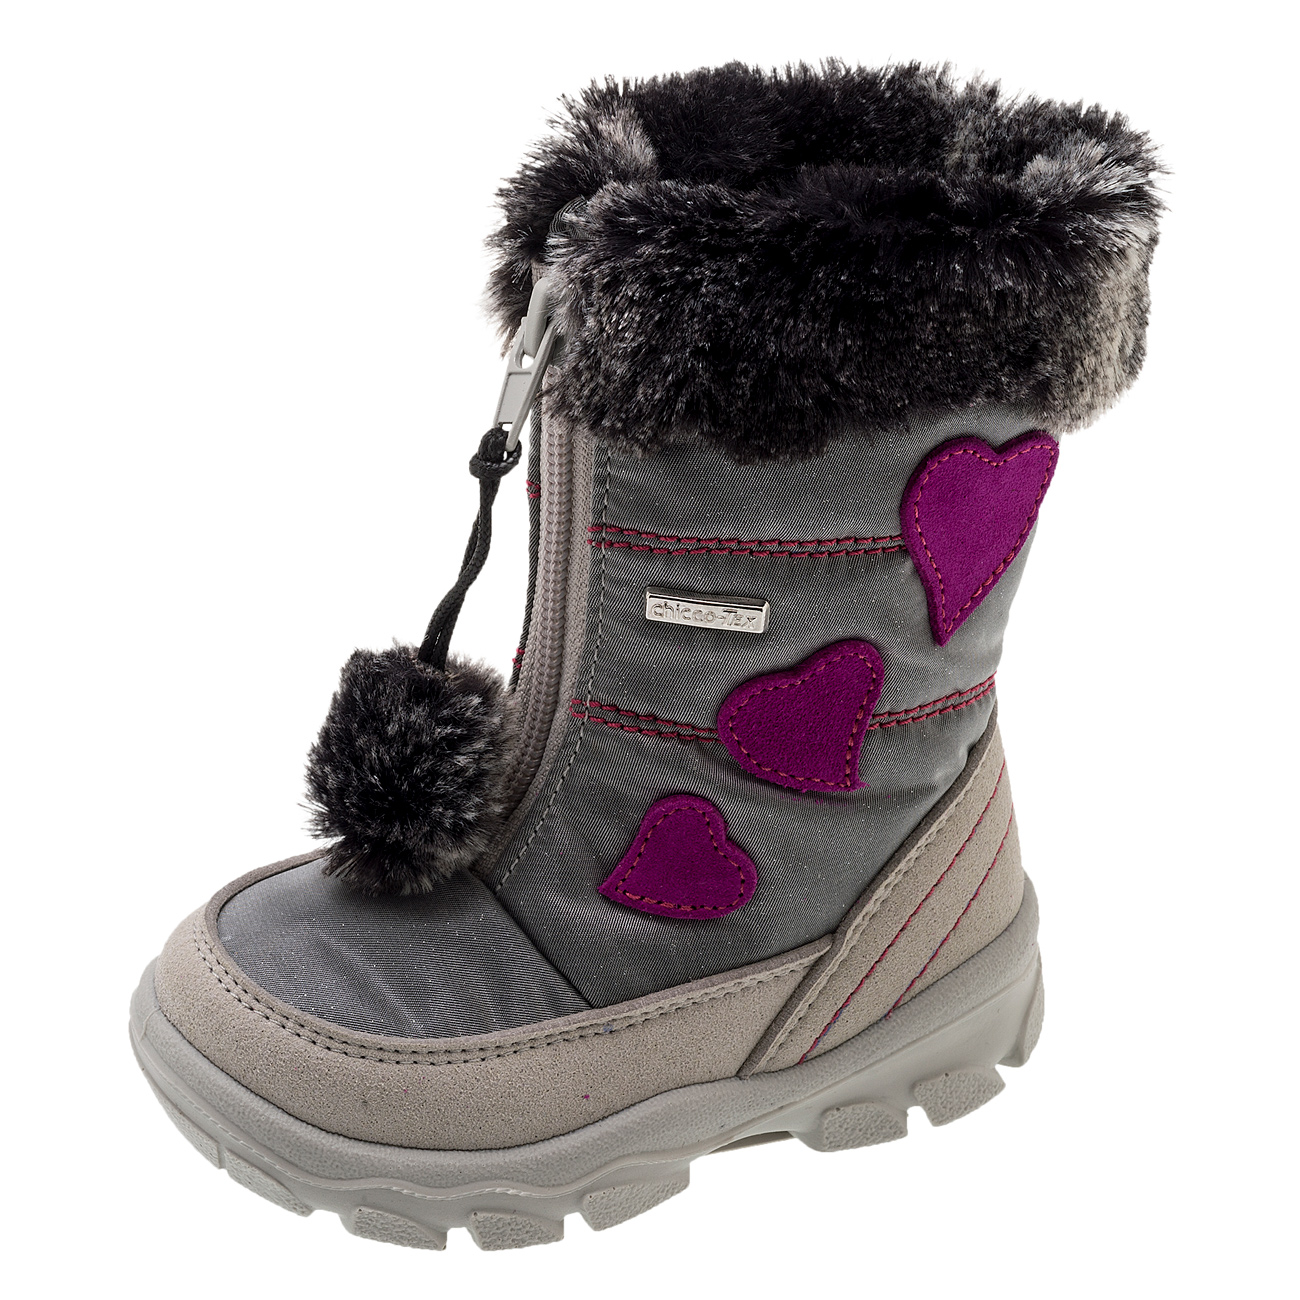 Pantof copii Chicco, gri